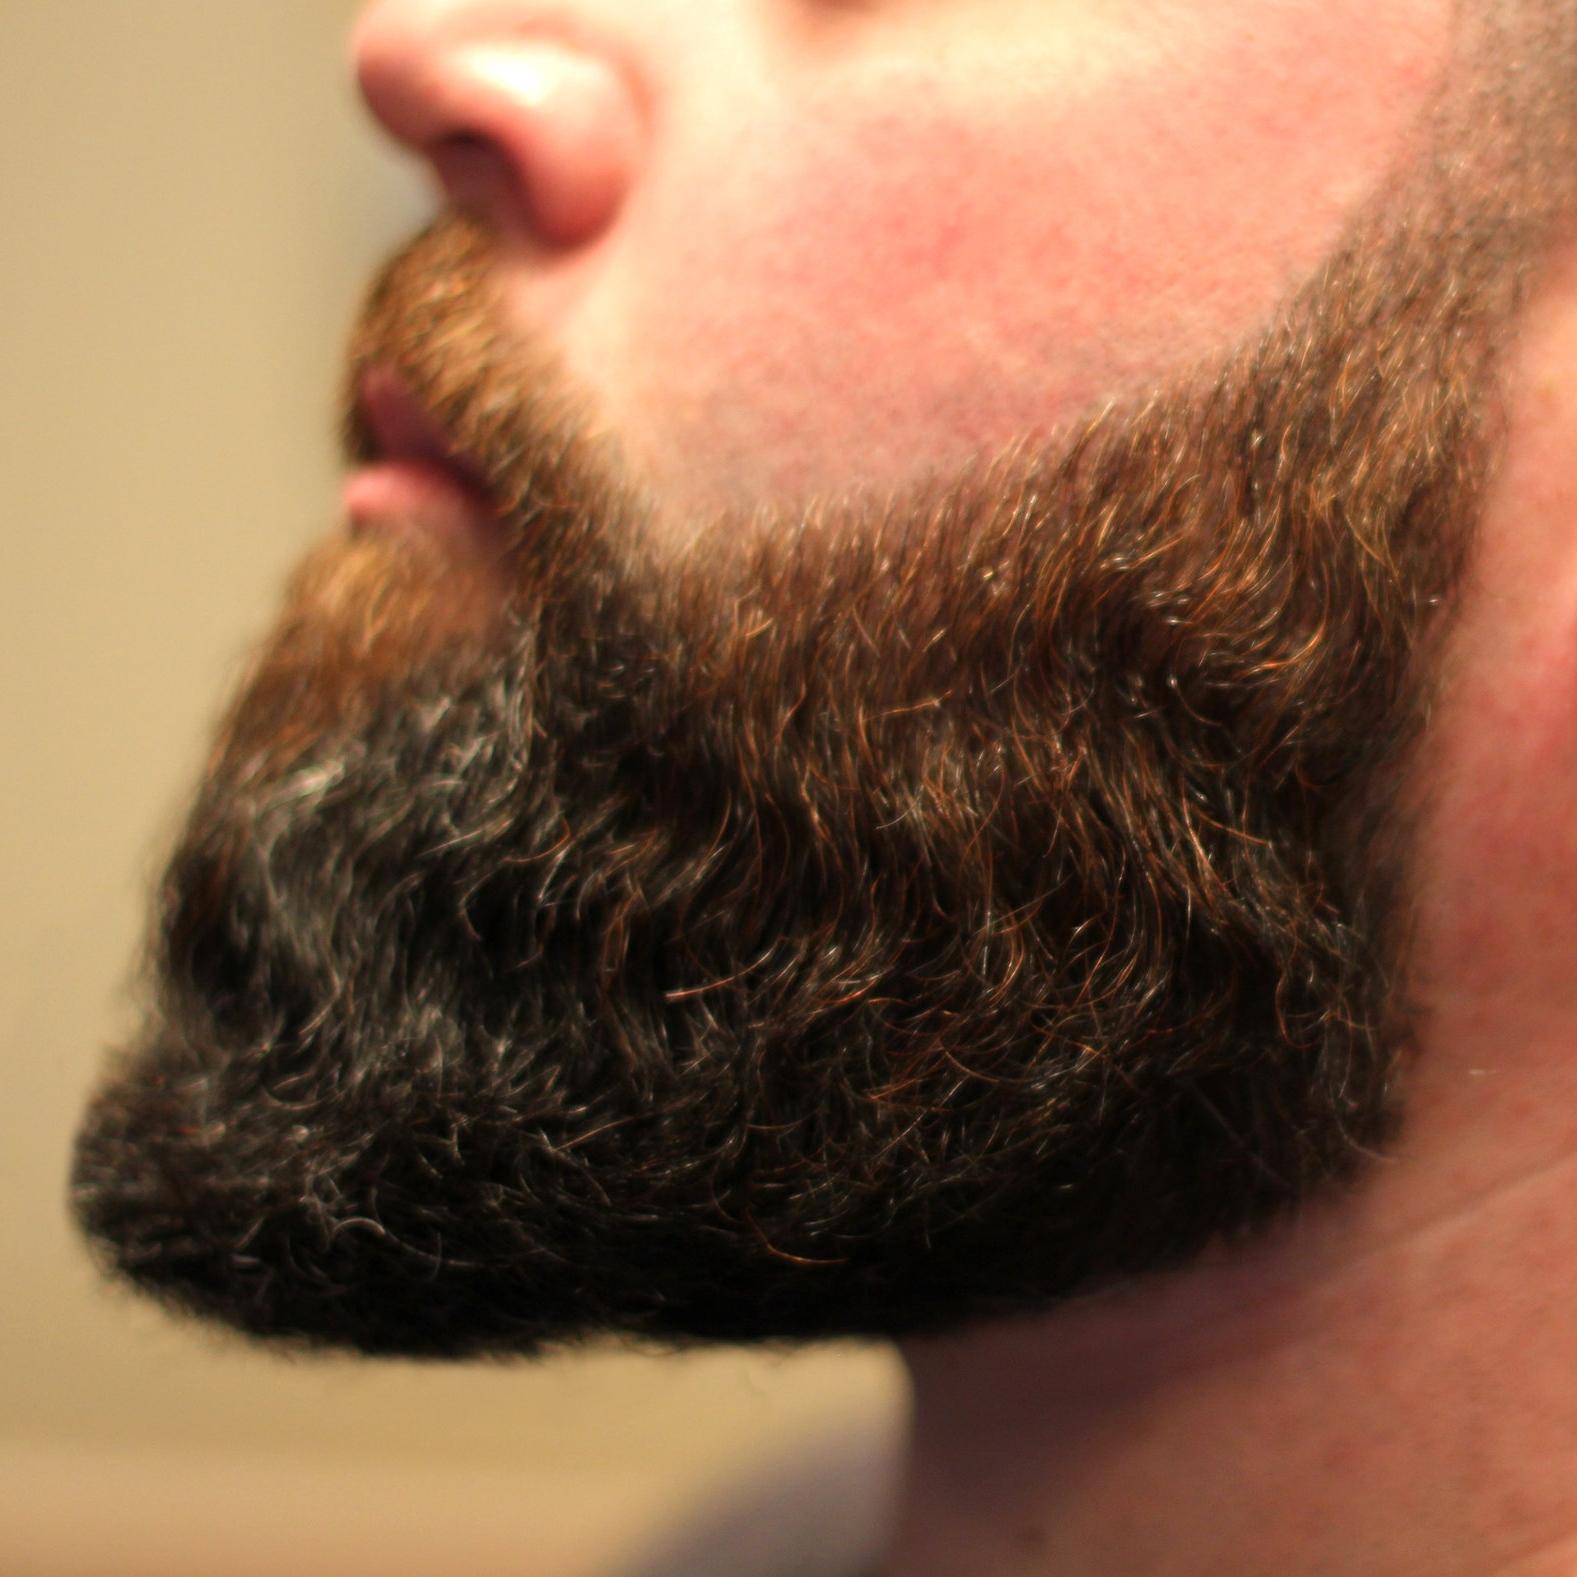 beard1.png